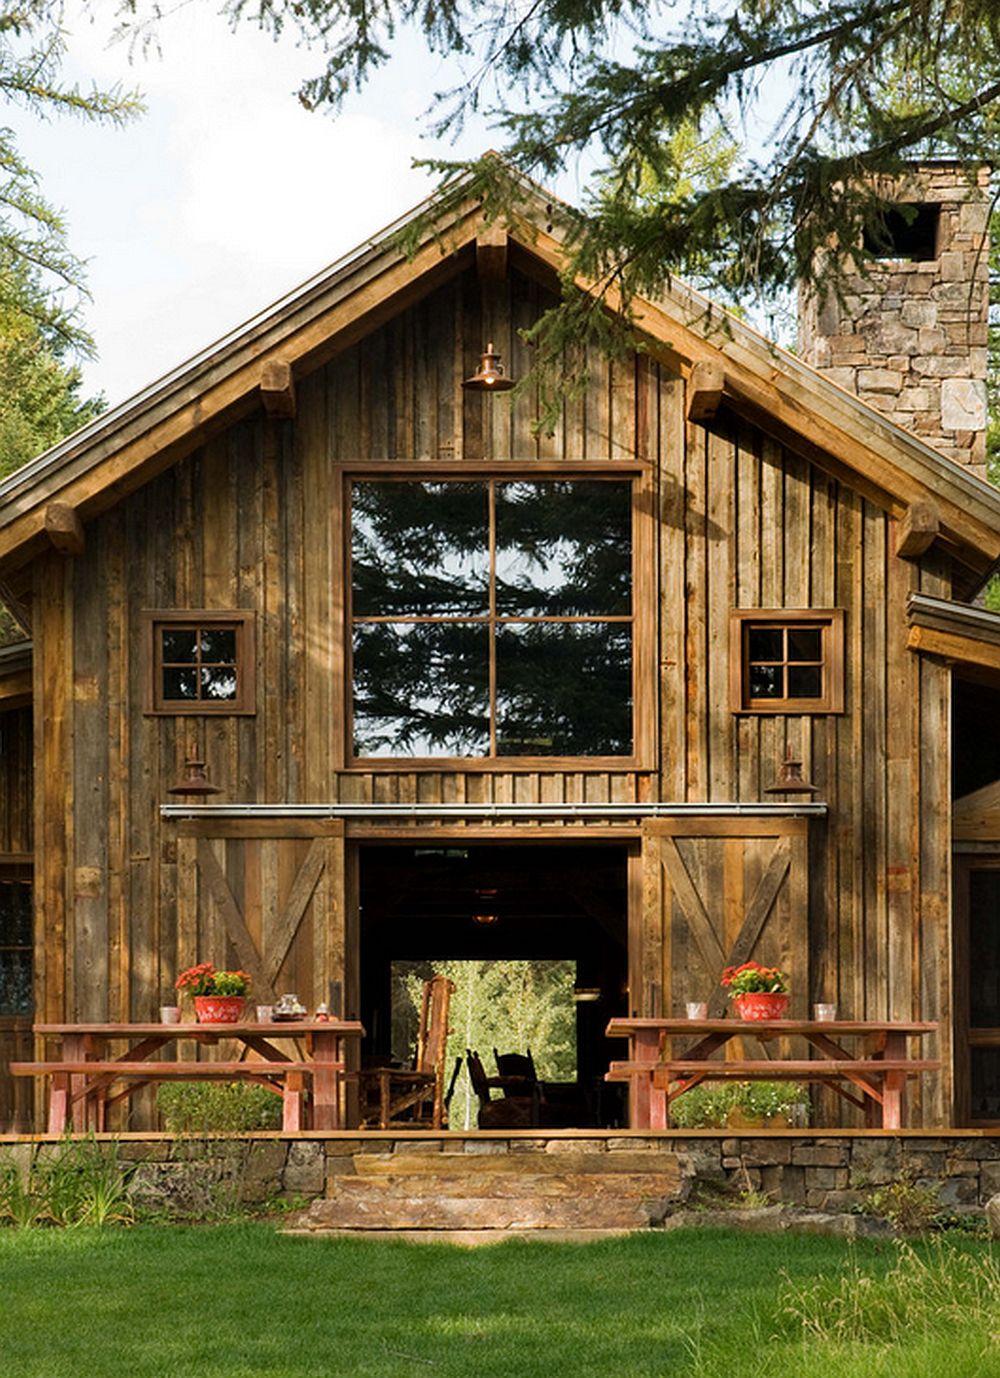 adelaparvu.com despre cabana din lemn vechi recuperat, cabana Swan Valley, Montana, RMT Architects (13)